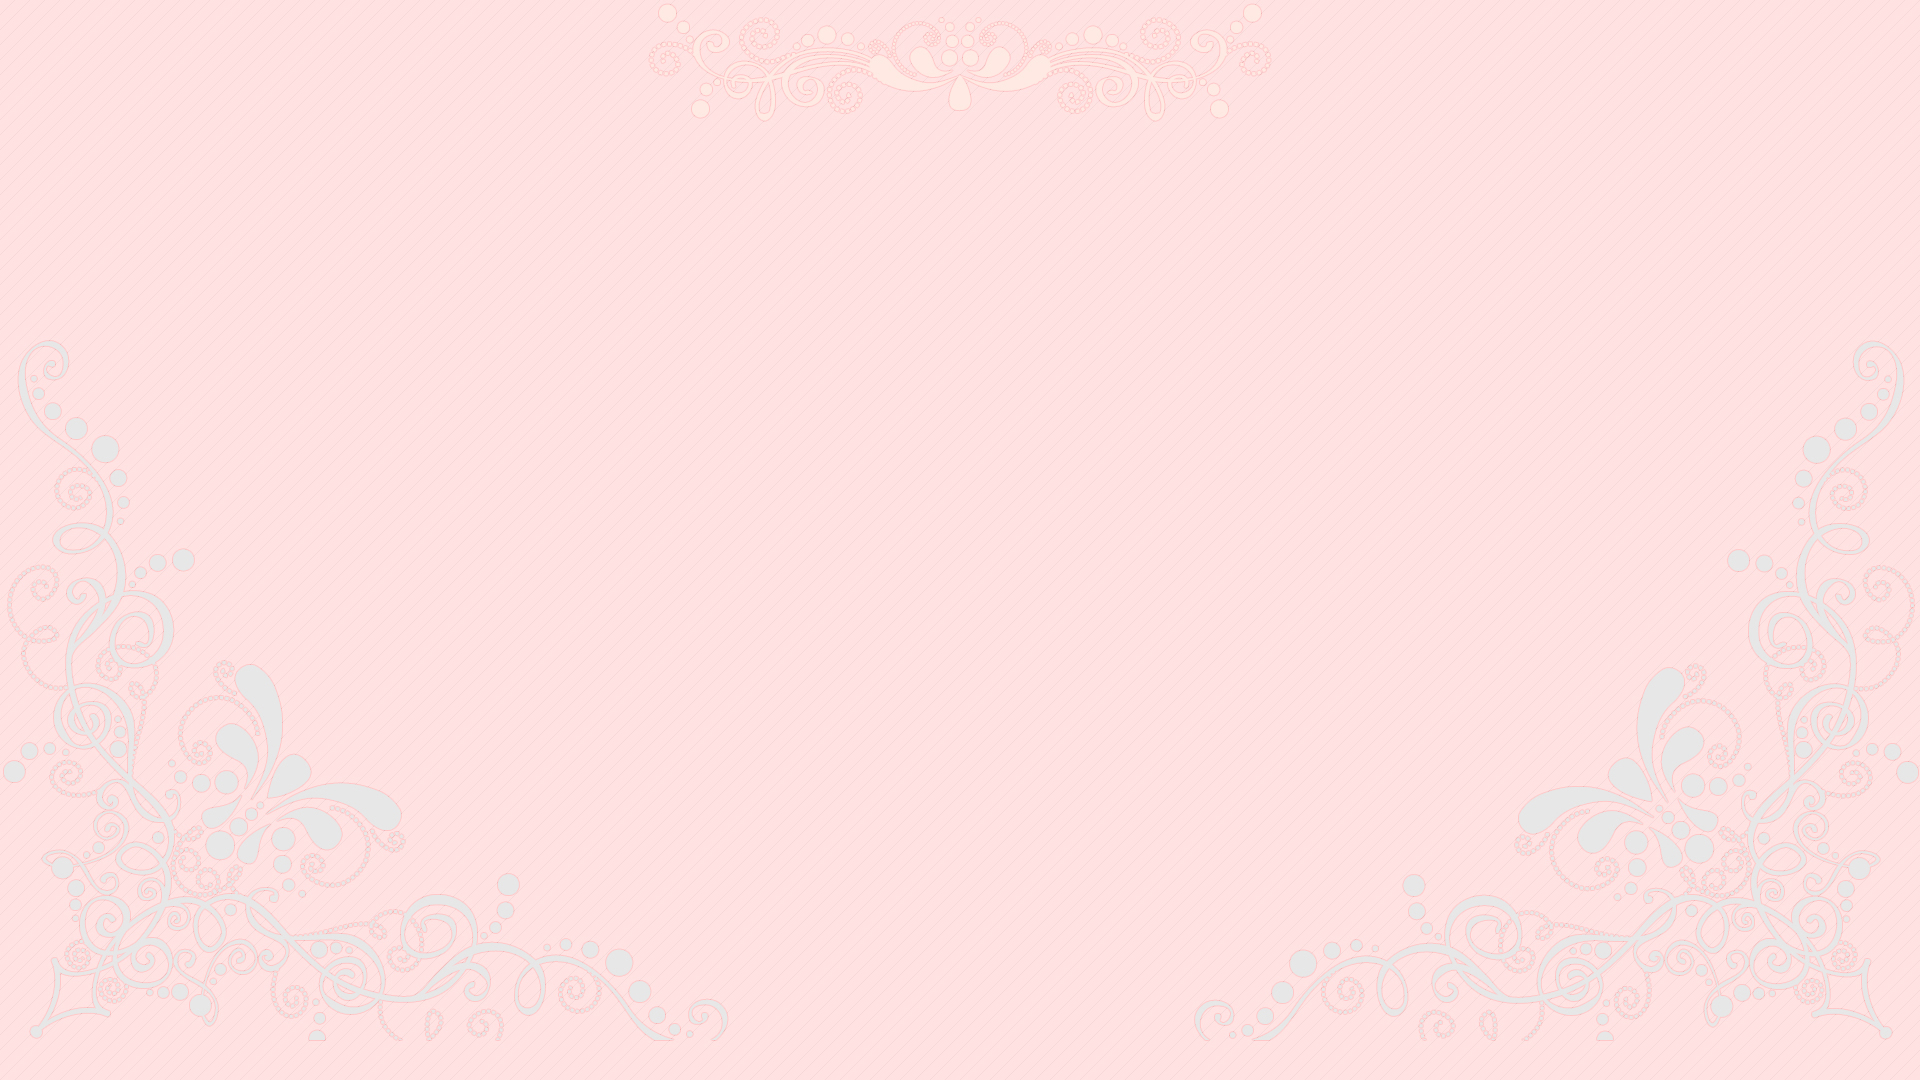 Pastel Pink Background wallpaper   994156 1920x1080